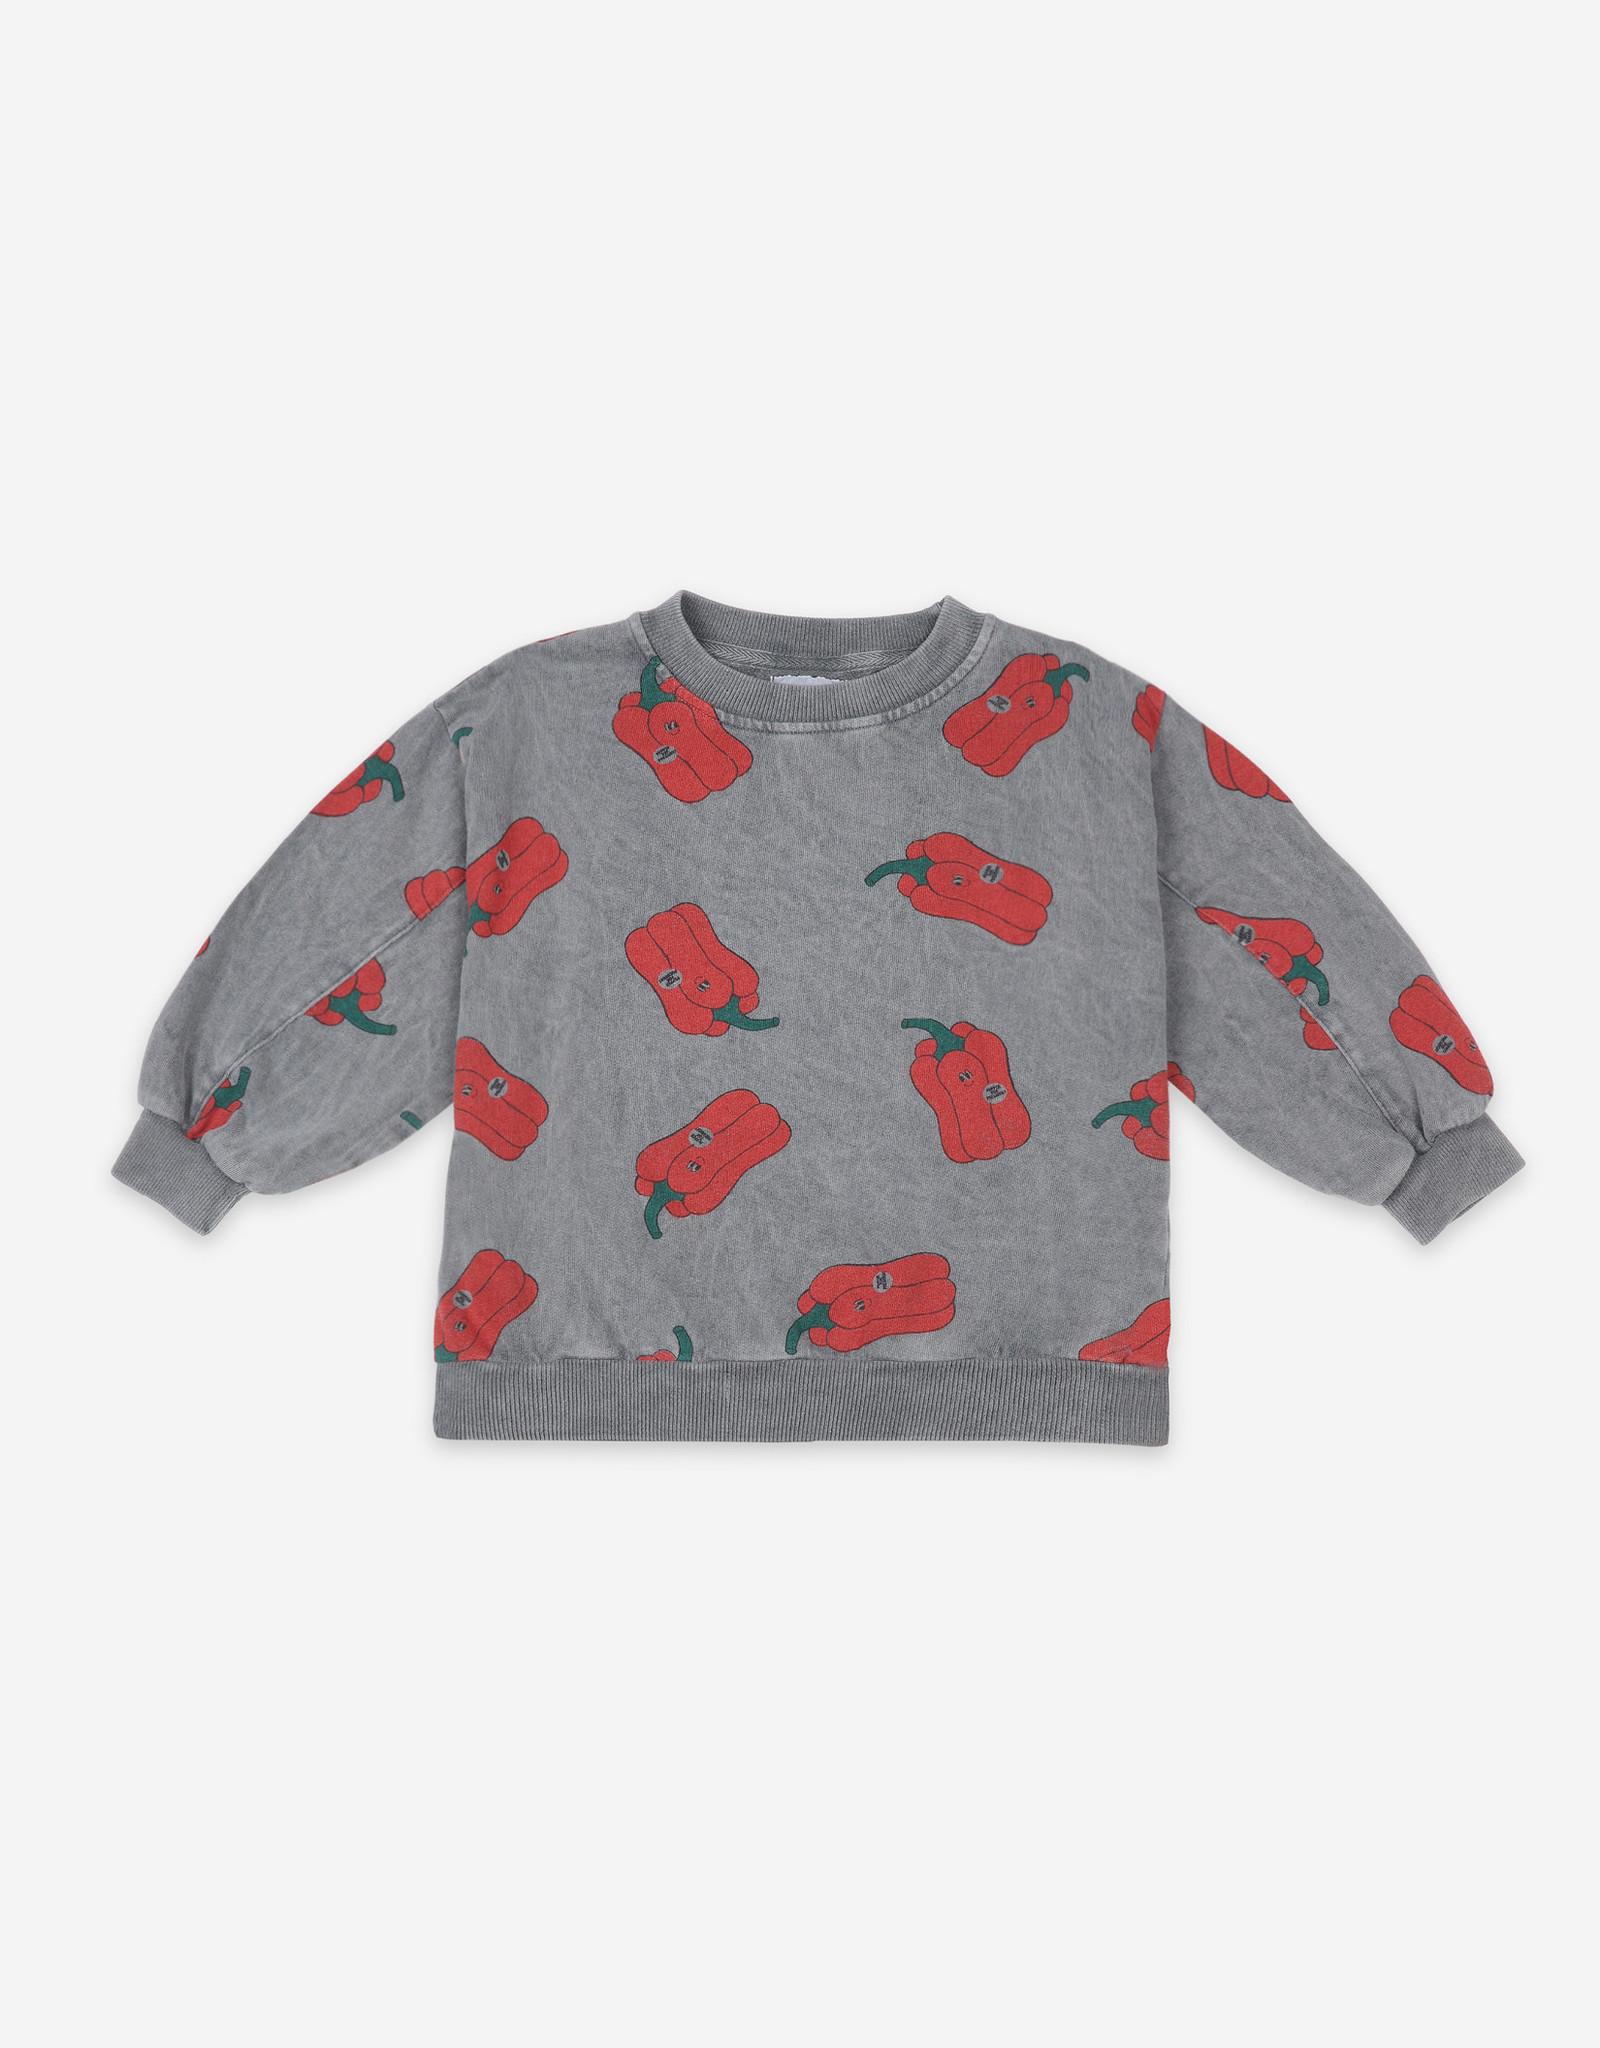 Bobo Choses Vote for Pepper Sweatshirt